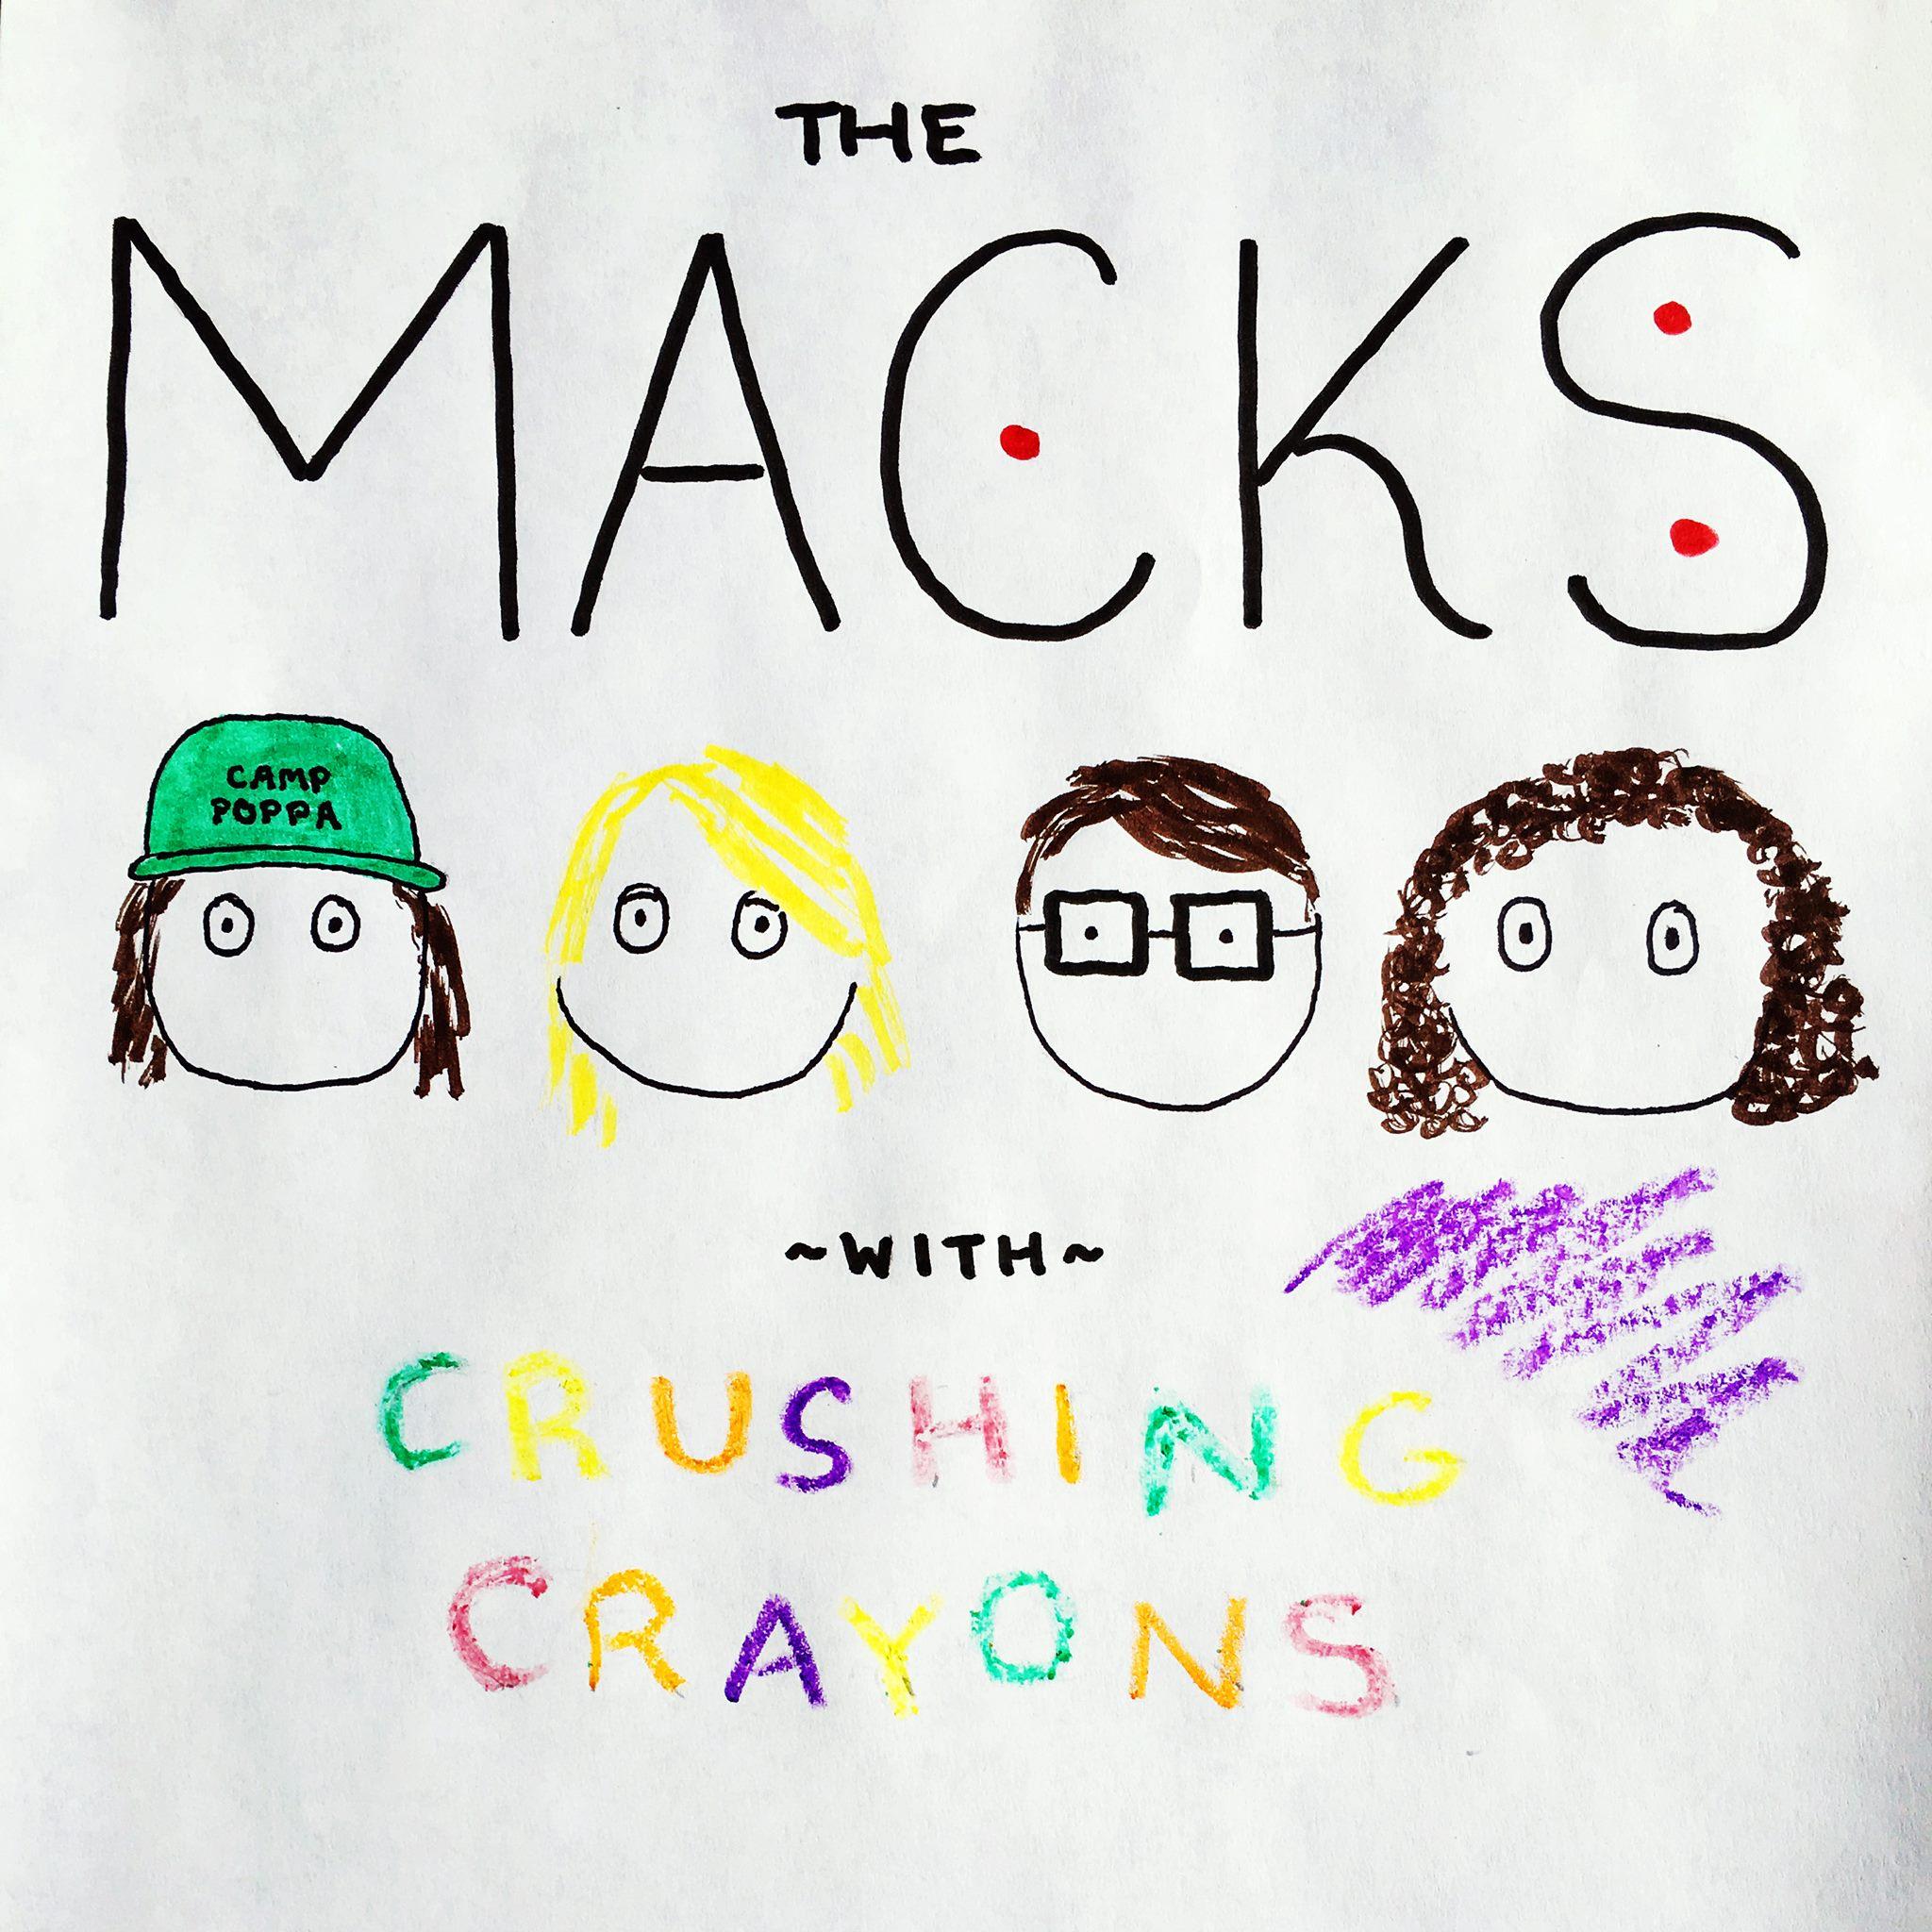 crushing crayons show